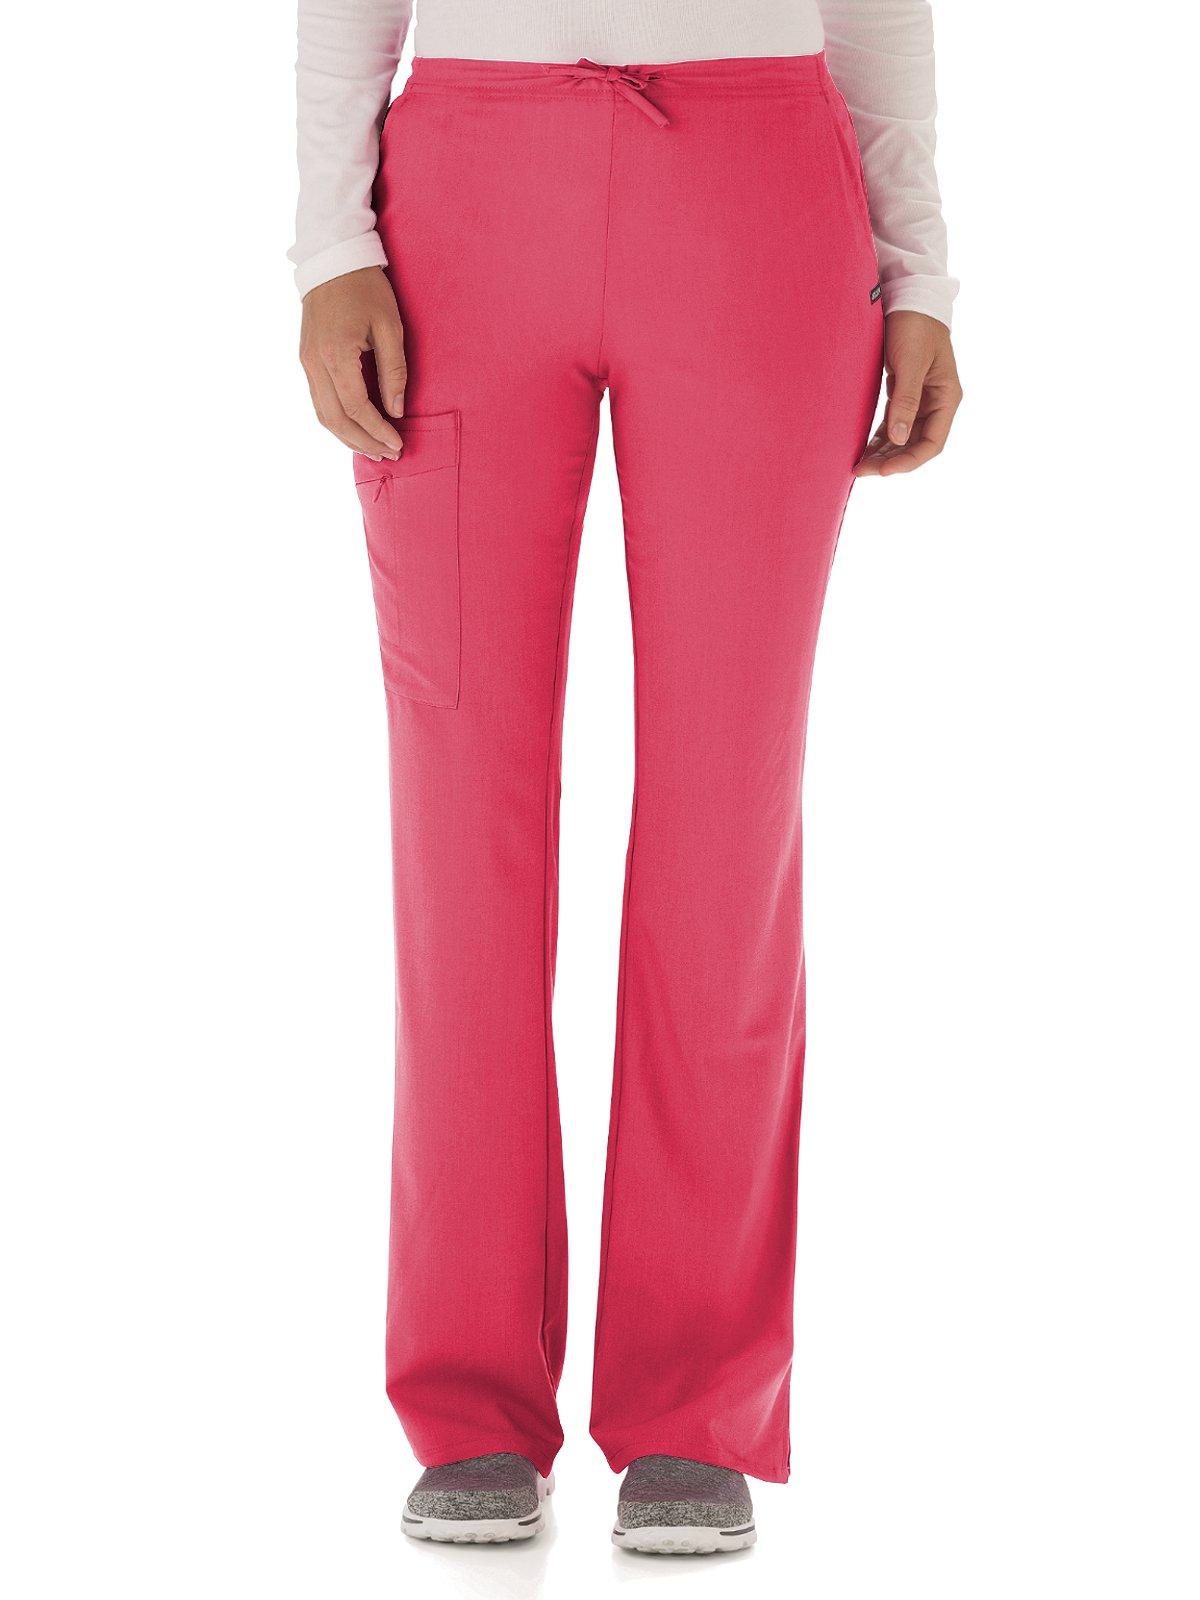 Classic Fit Collection by Jockey Women's Tri Blend Zipper Scrub Pants Medium Hibiscus